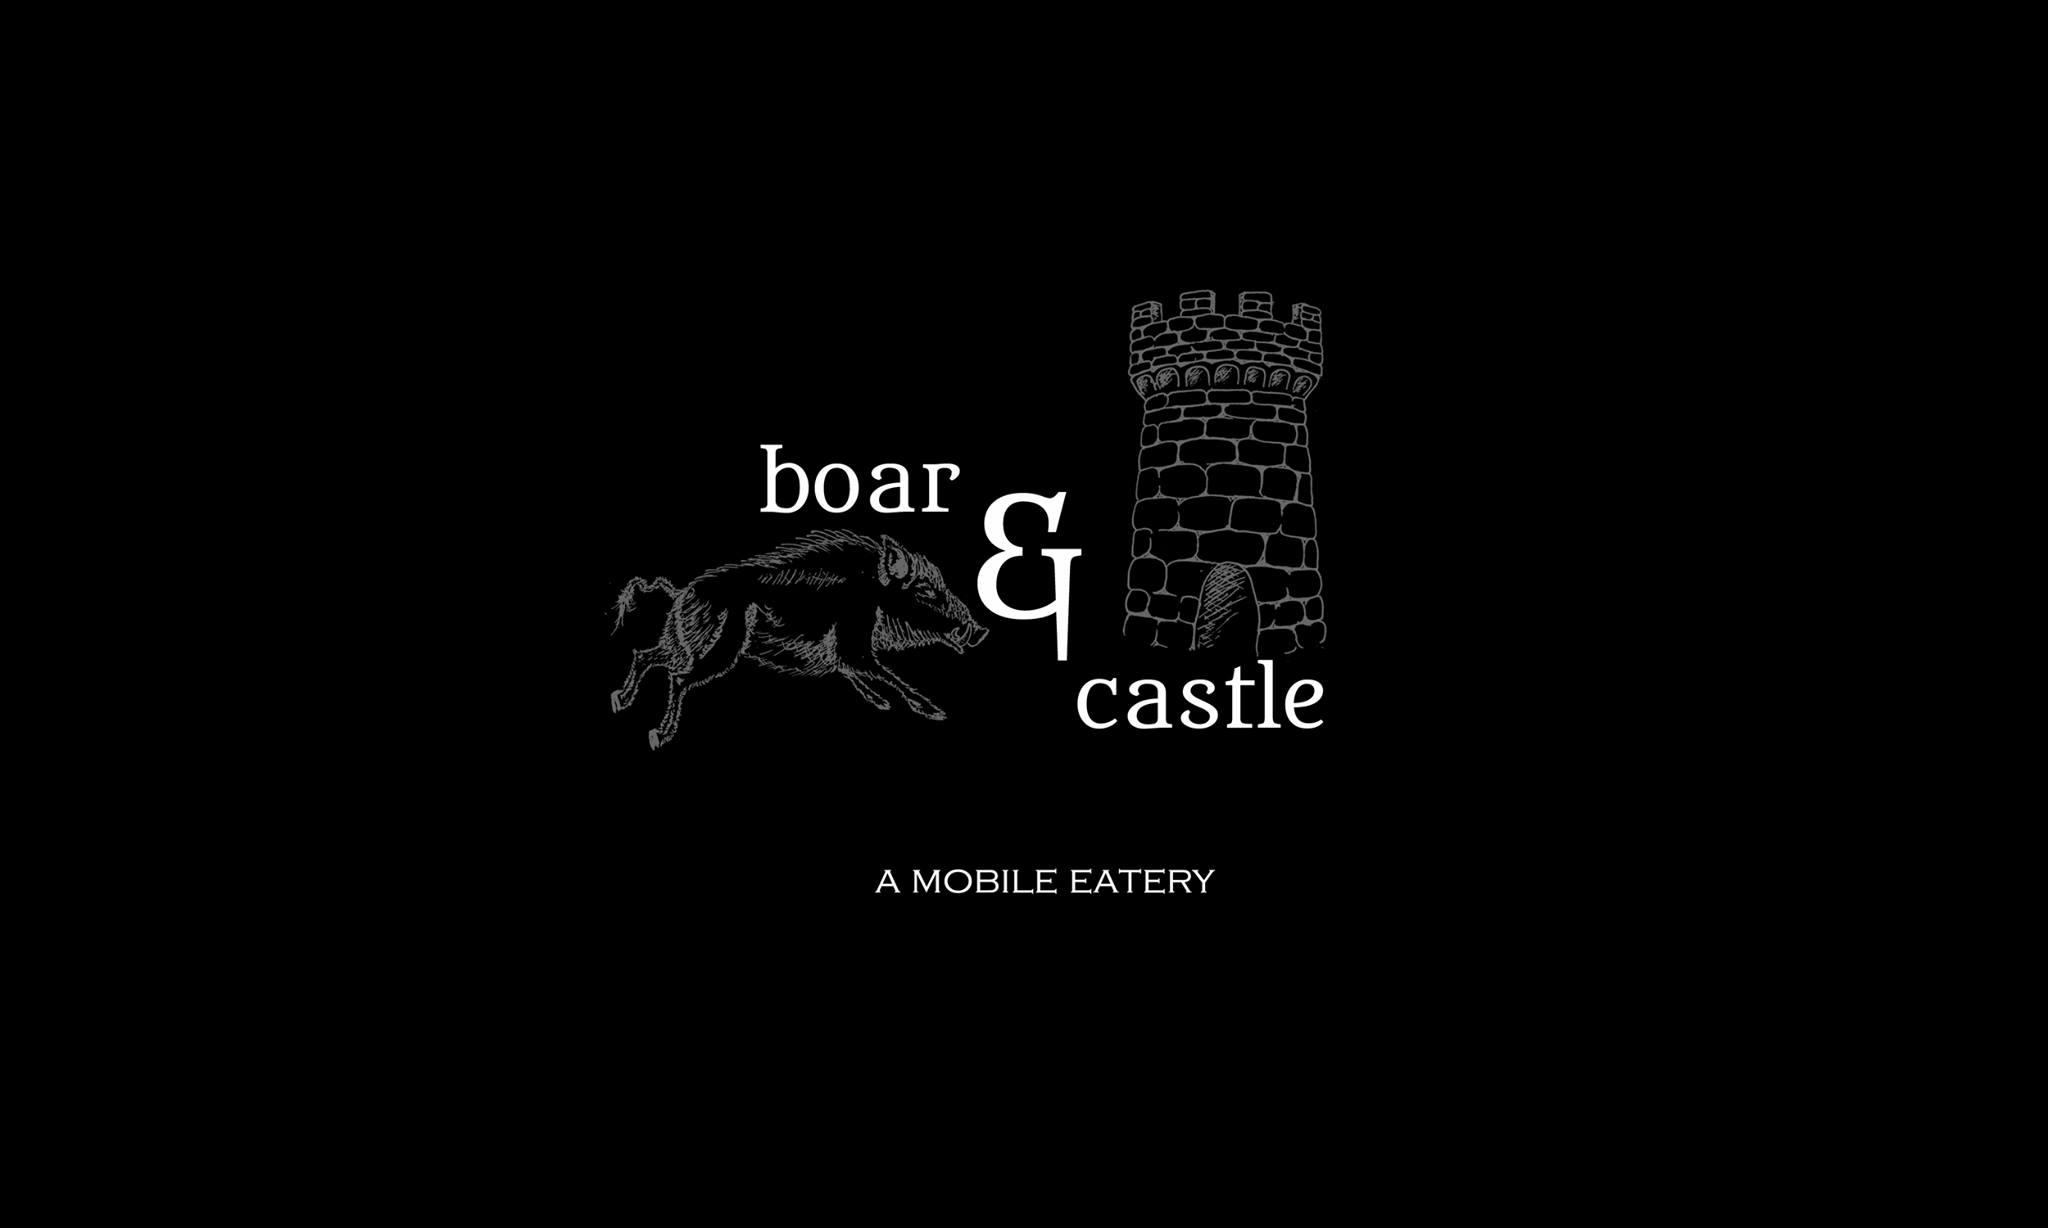 Boar & Castle Mobile Eatery logo